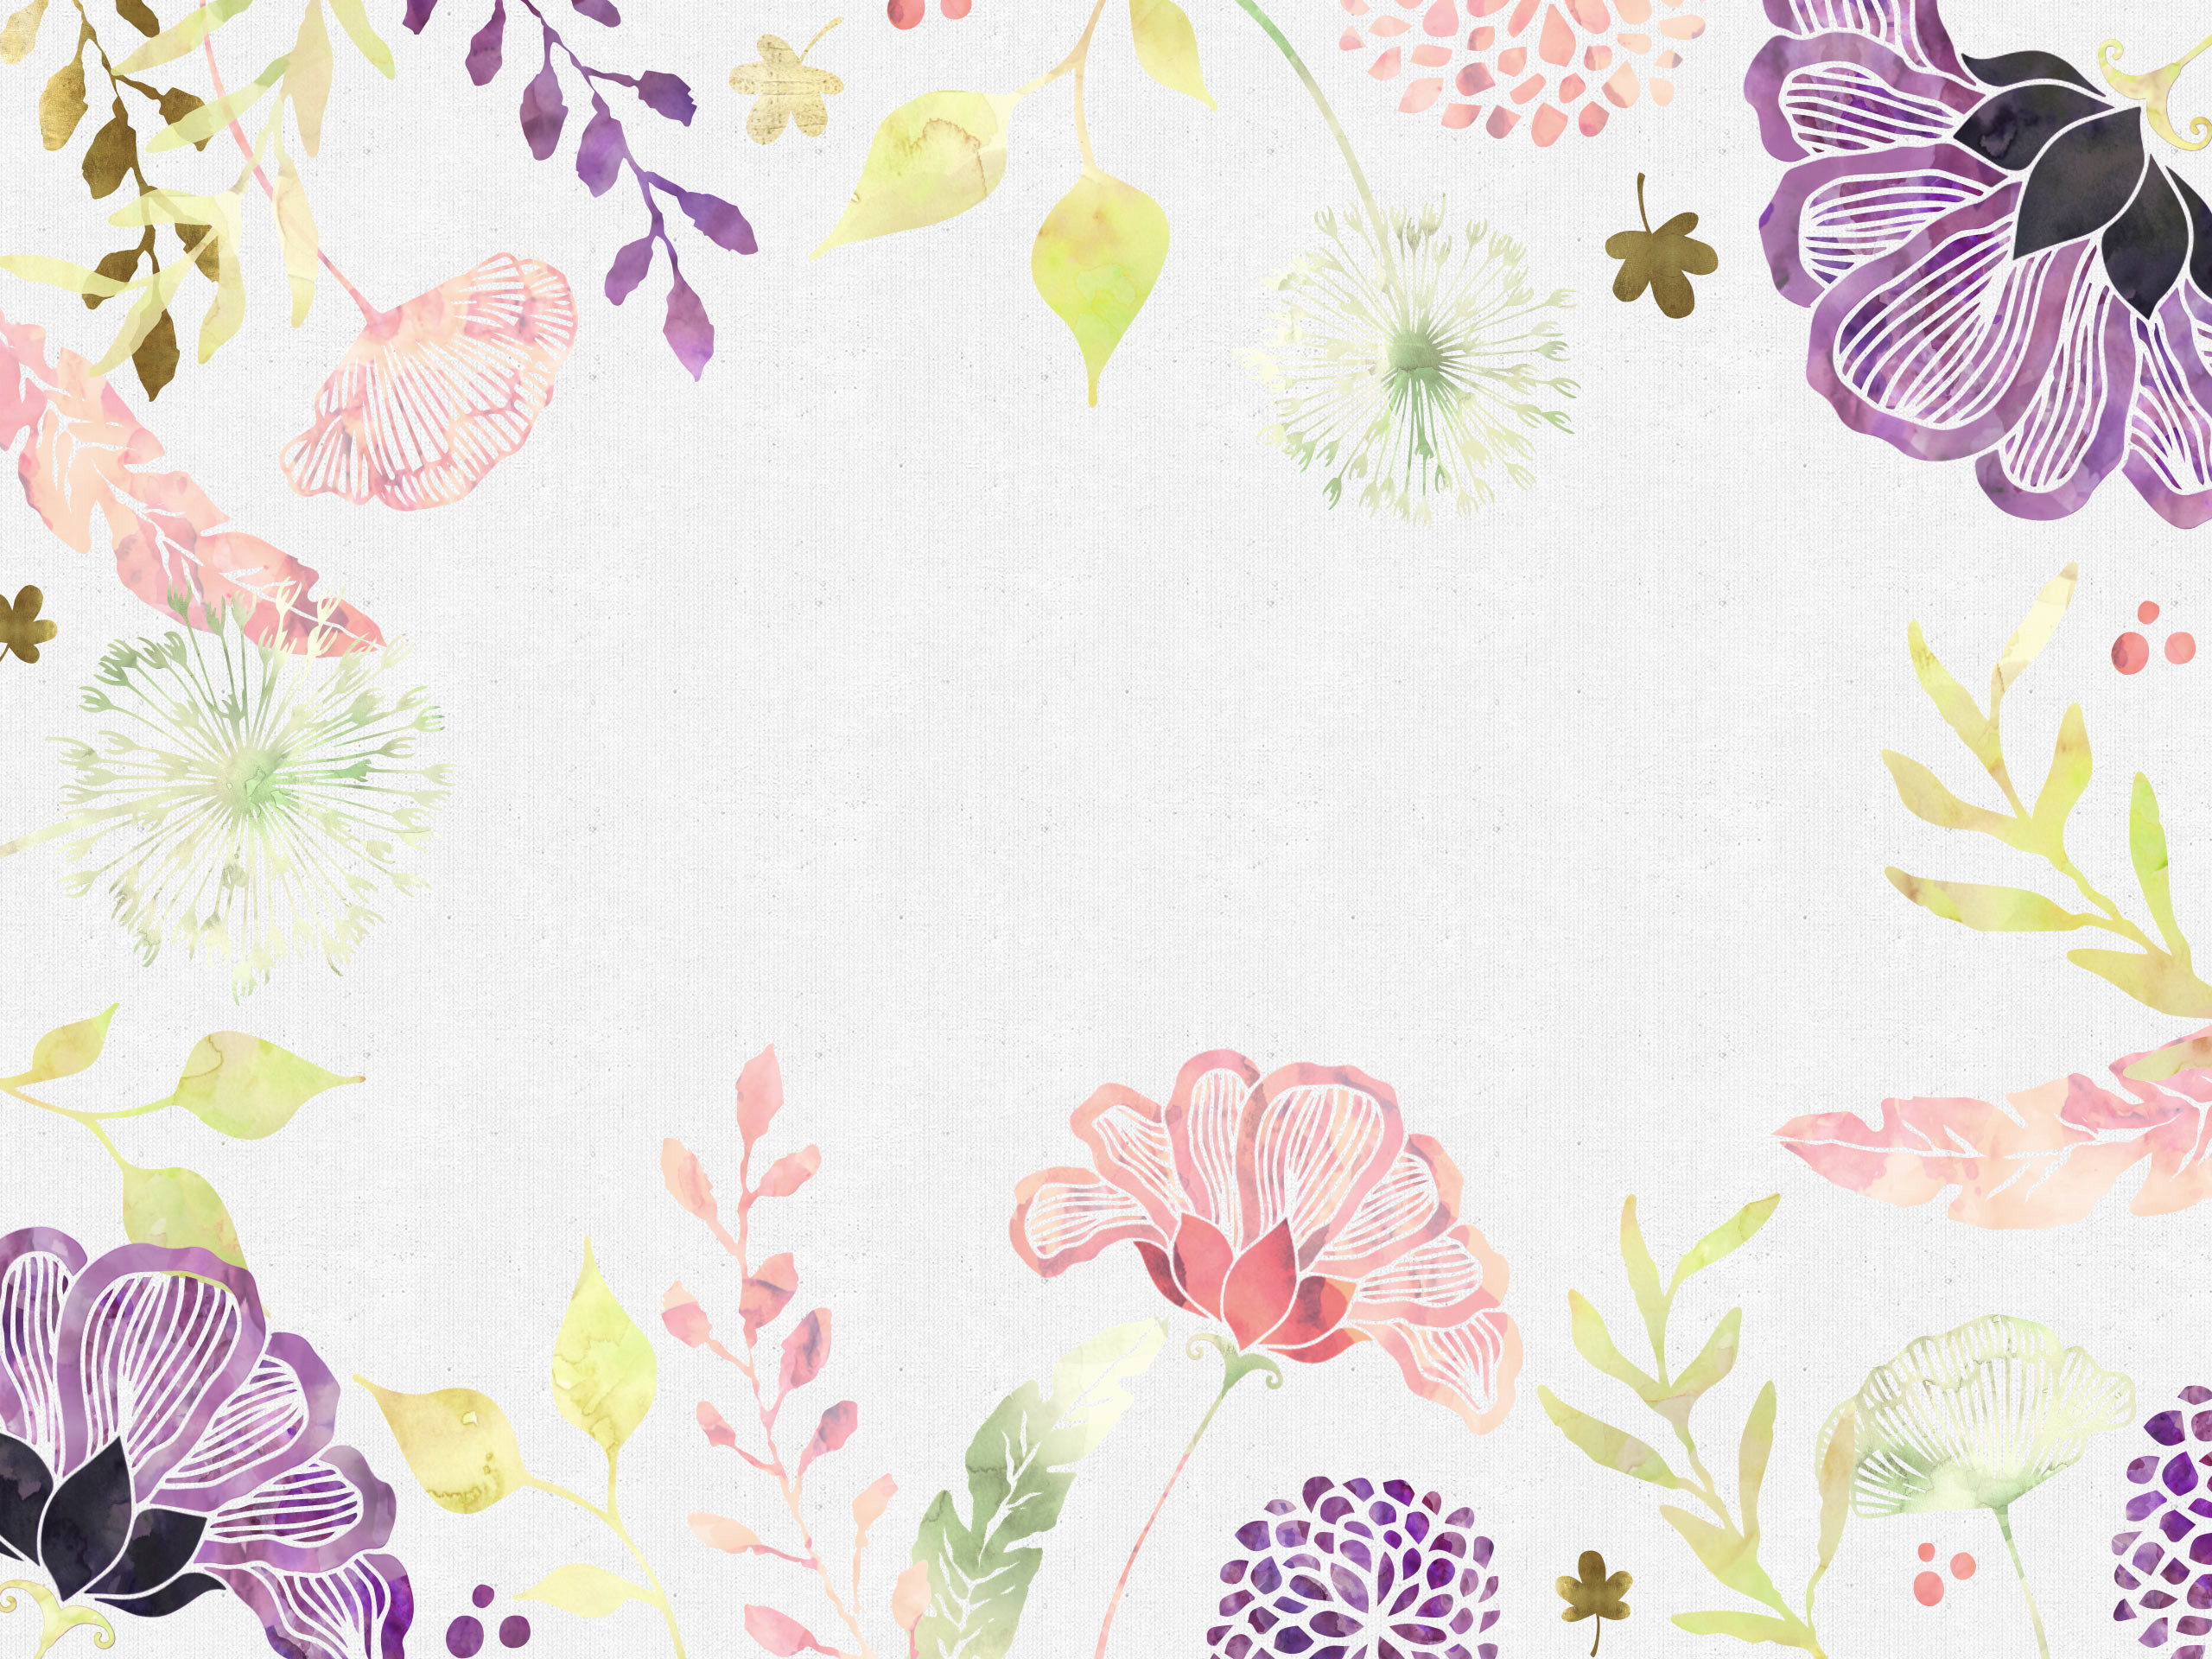 65 Free Flower Desktop Backgrounds On Wallpapersafari